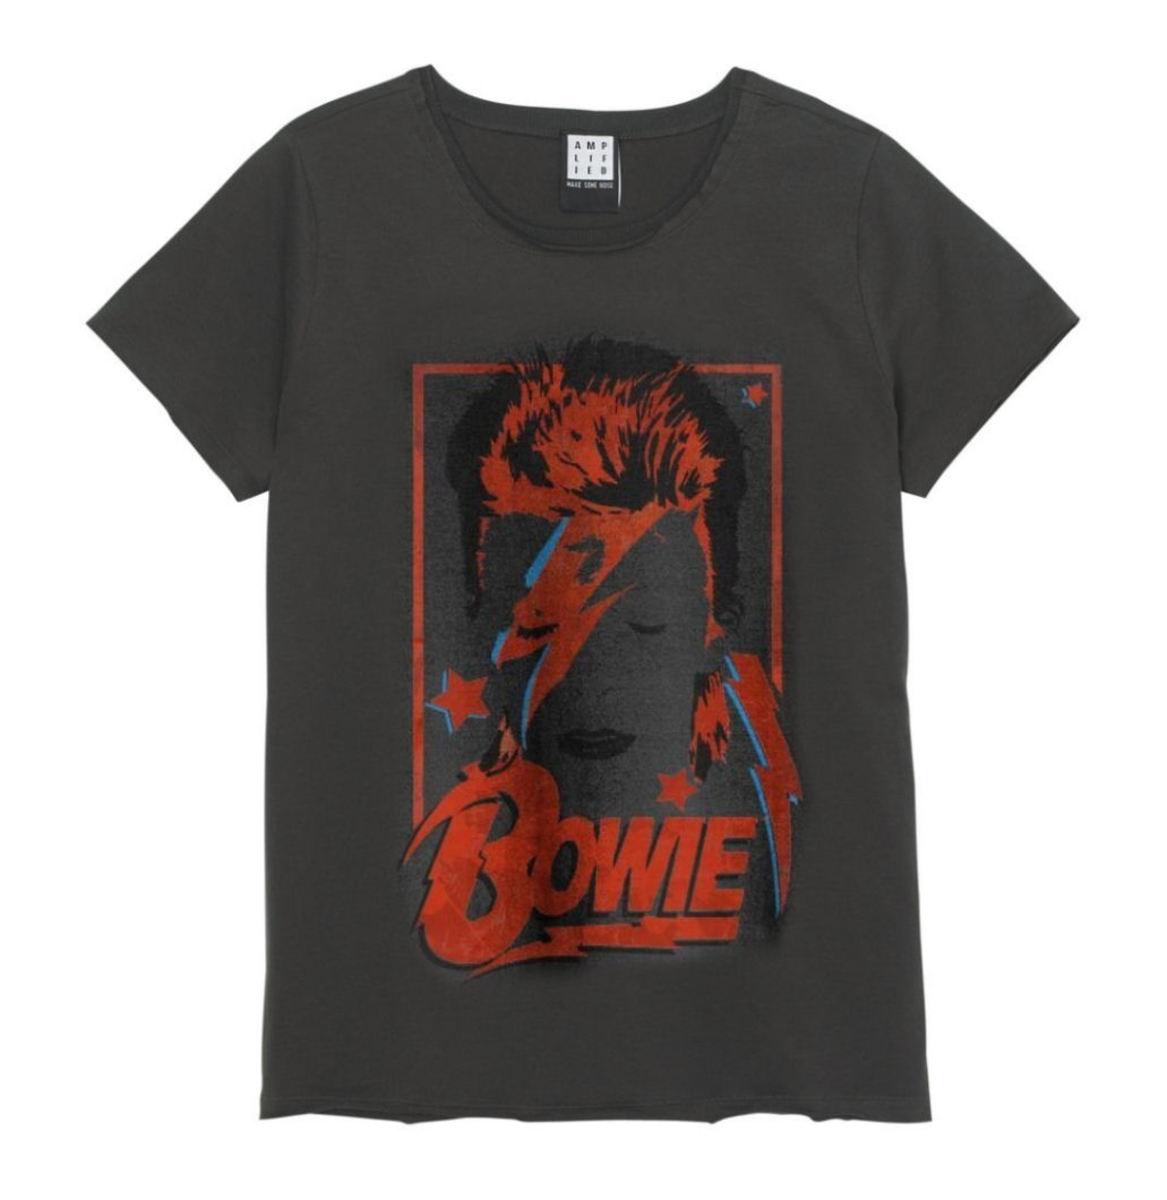 AMPLIFIED David Bowie Alladin sane Čierna